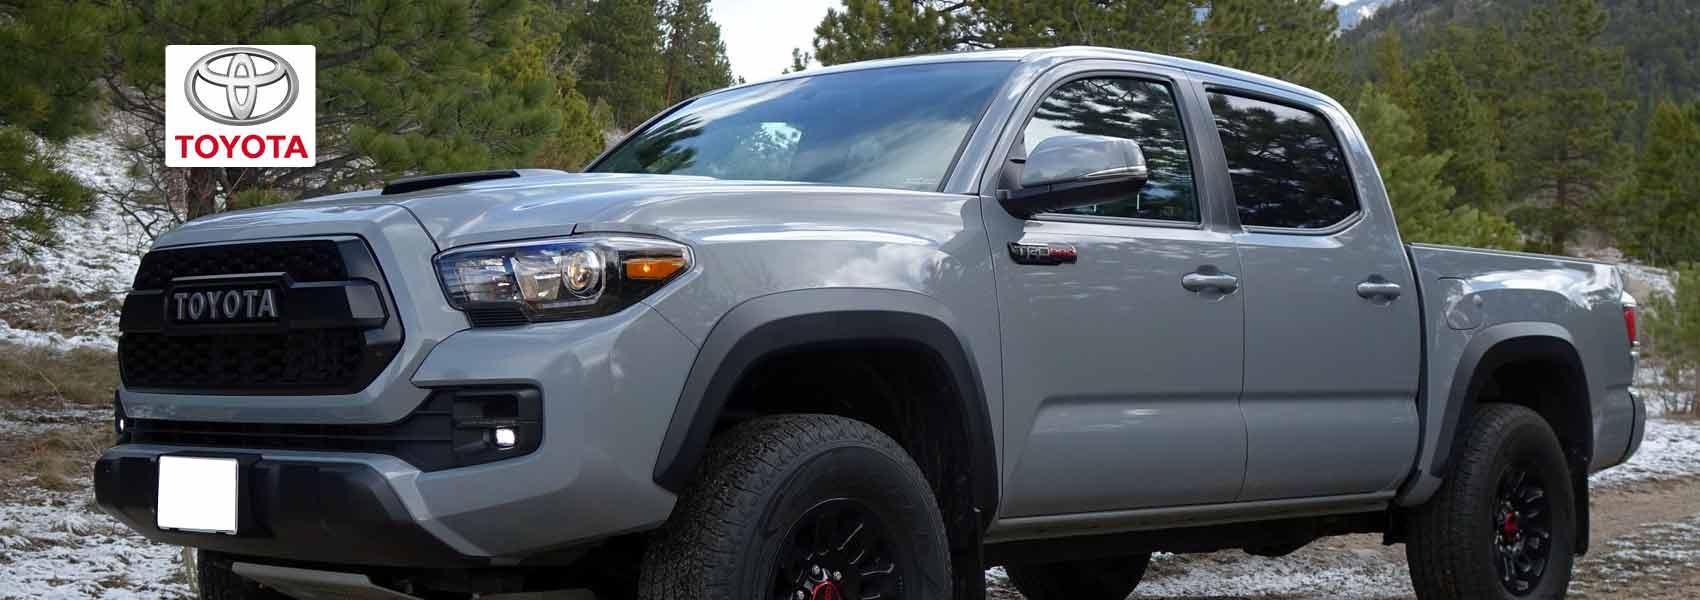 Toyota Tacoma Parts >> Toyota Tacoma Parts Buy Used Toyota Tacoma Parts Online Best Price